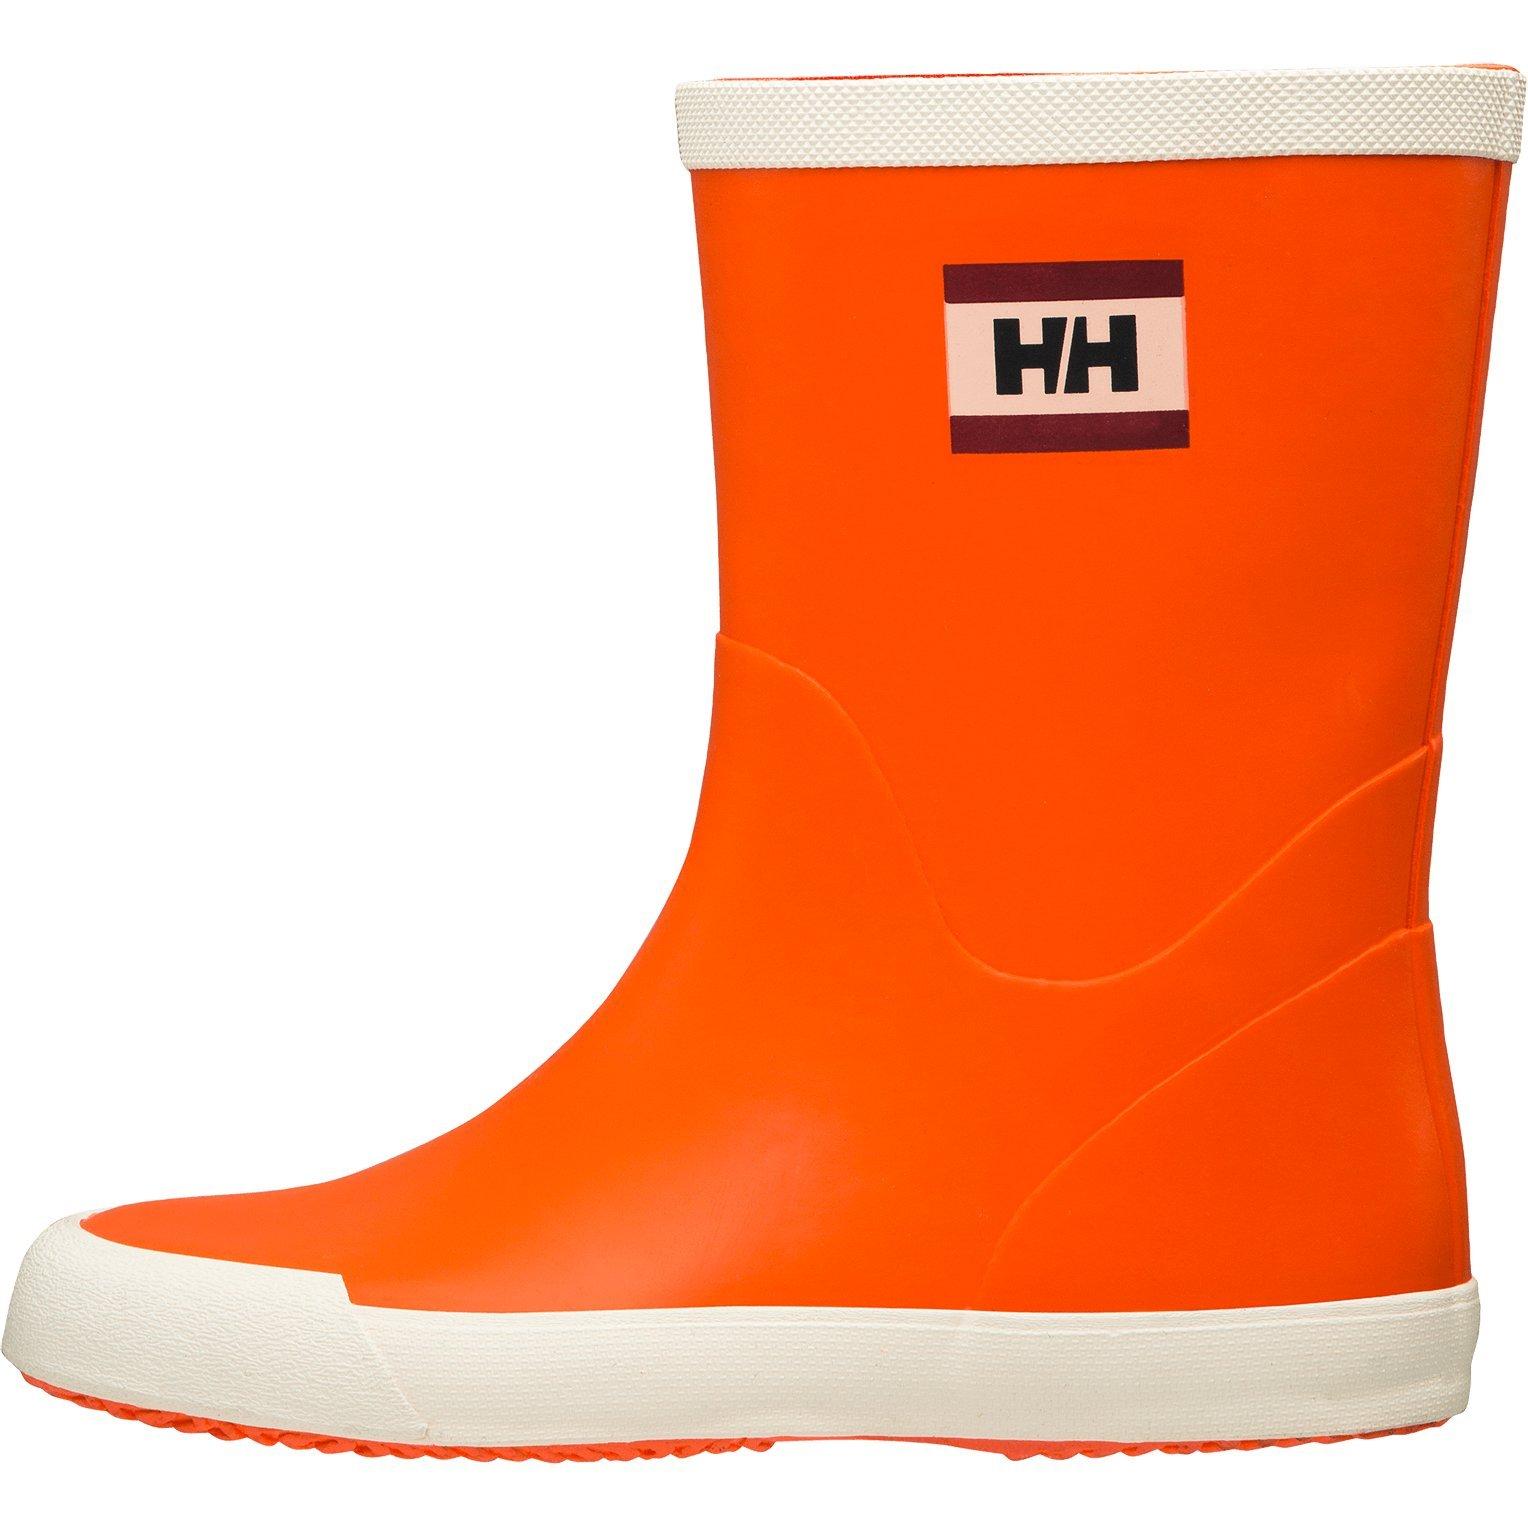 Helly Hansen Women's Nordvik Rain Boots, Pumpkin/Off White (Matte), 10